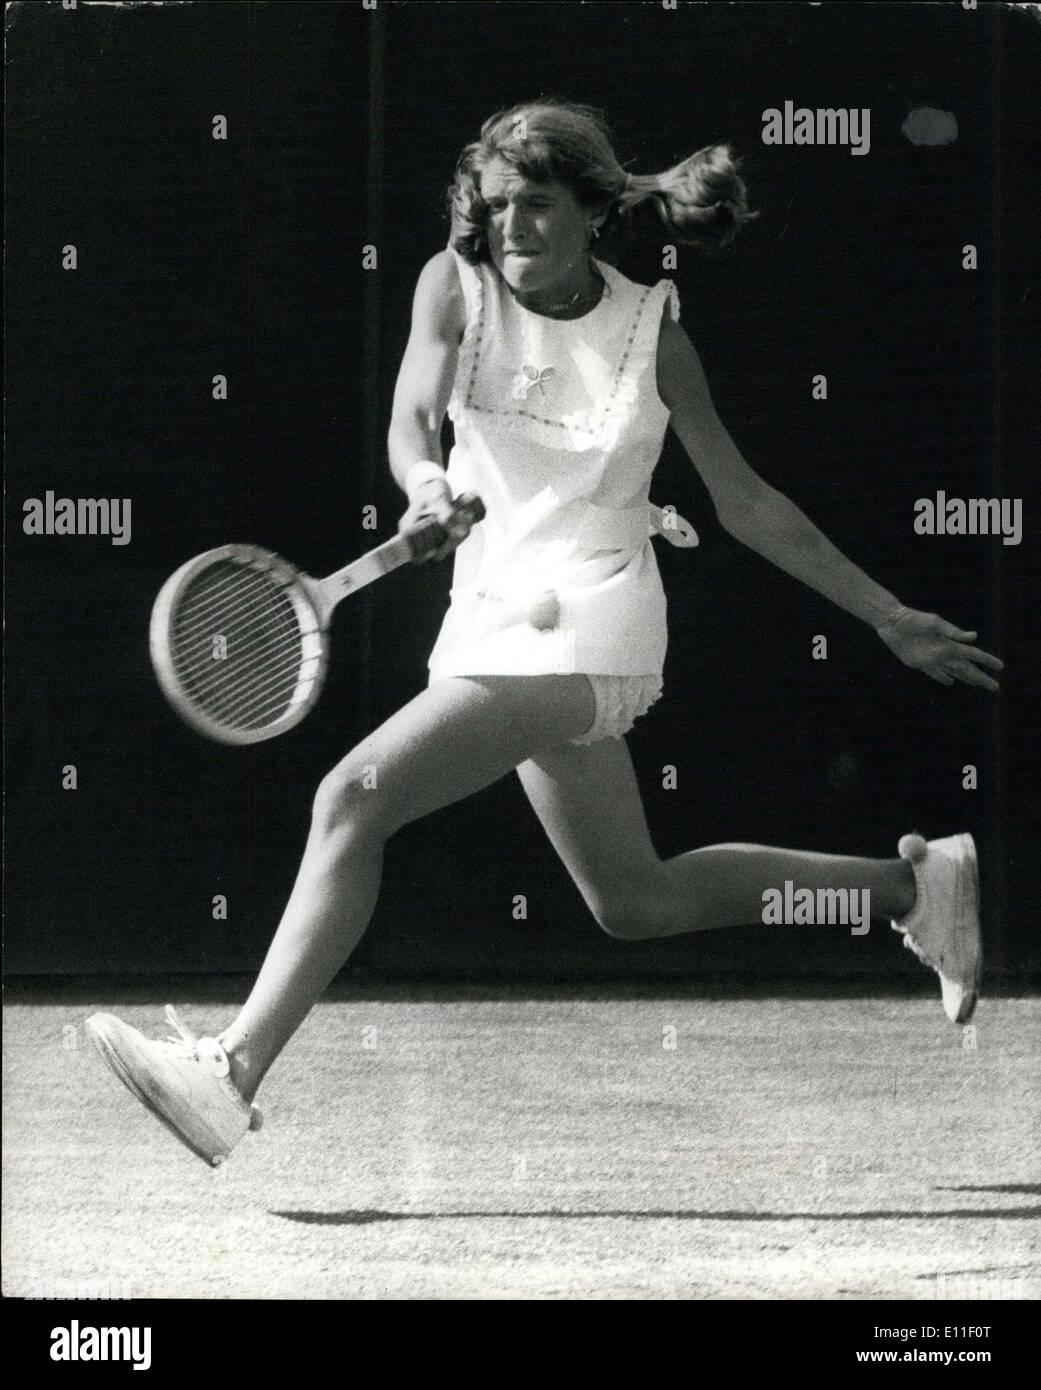 Jun 22 1977 Wimbledon Tennis 14 year old Tracy Austin wins